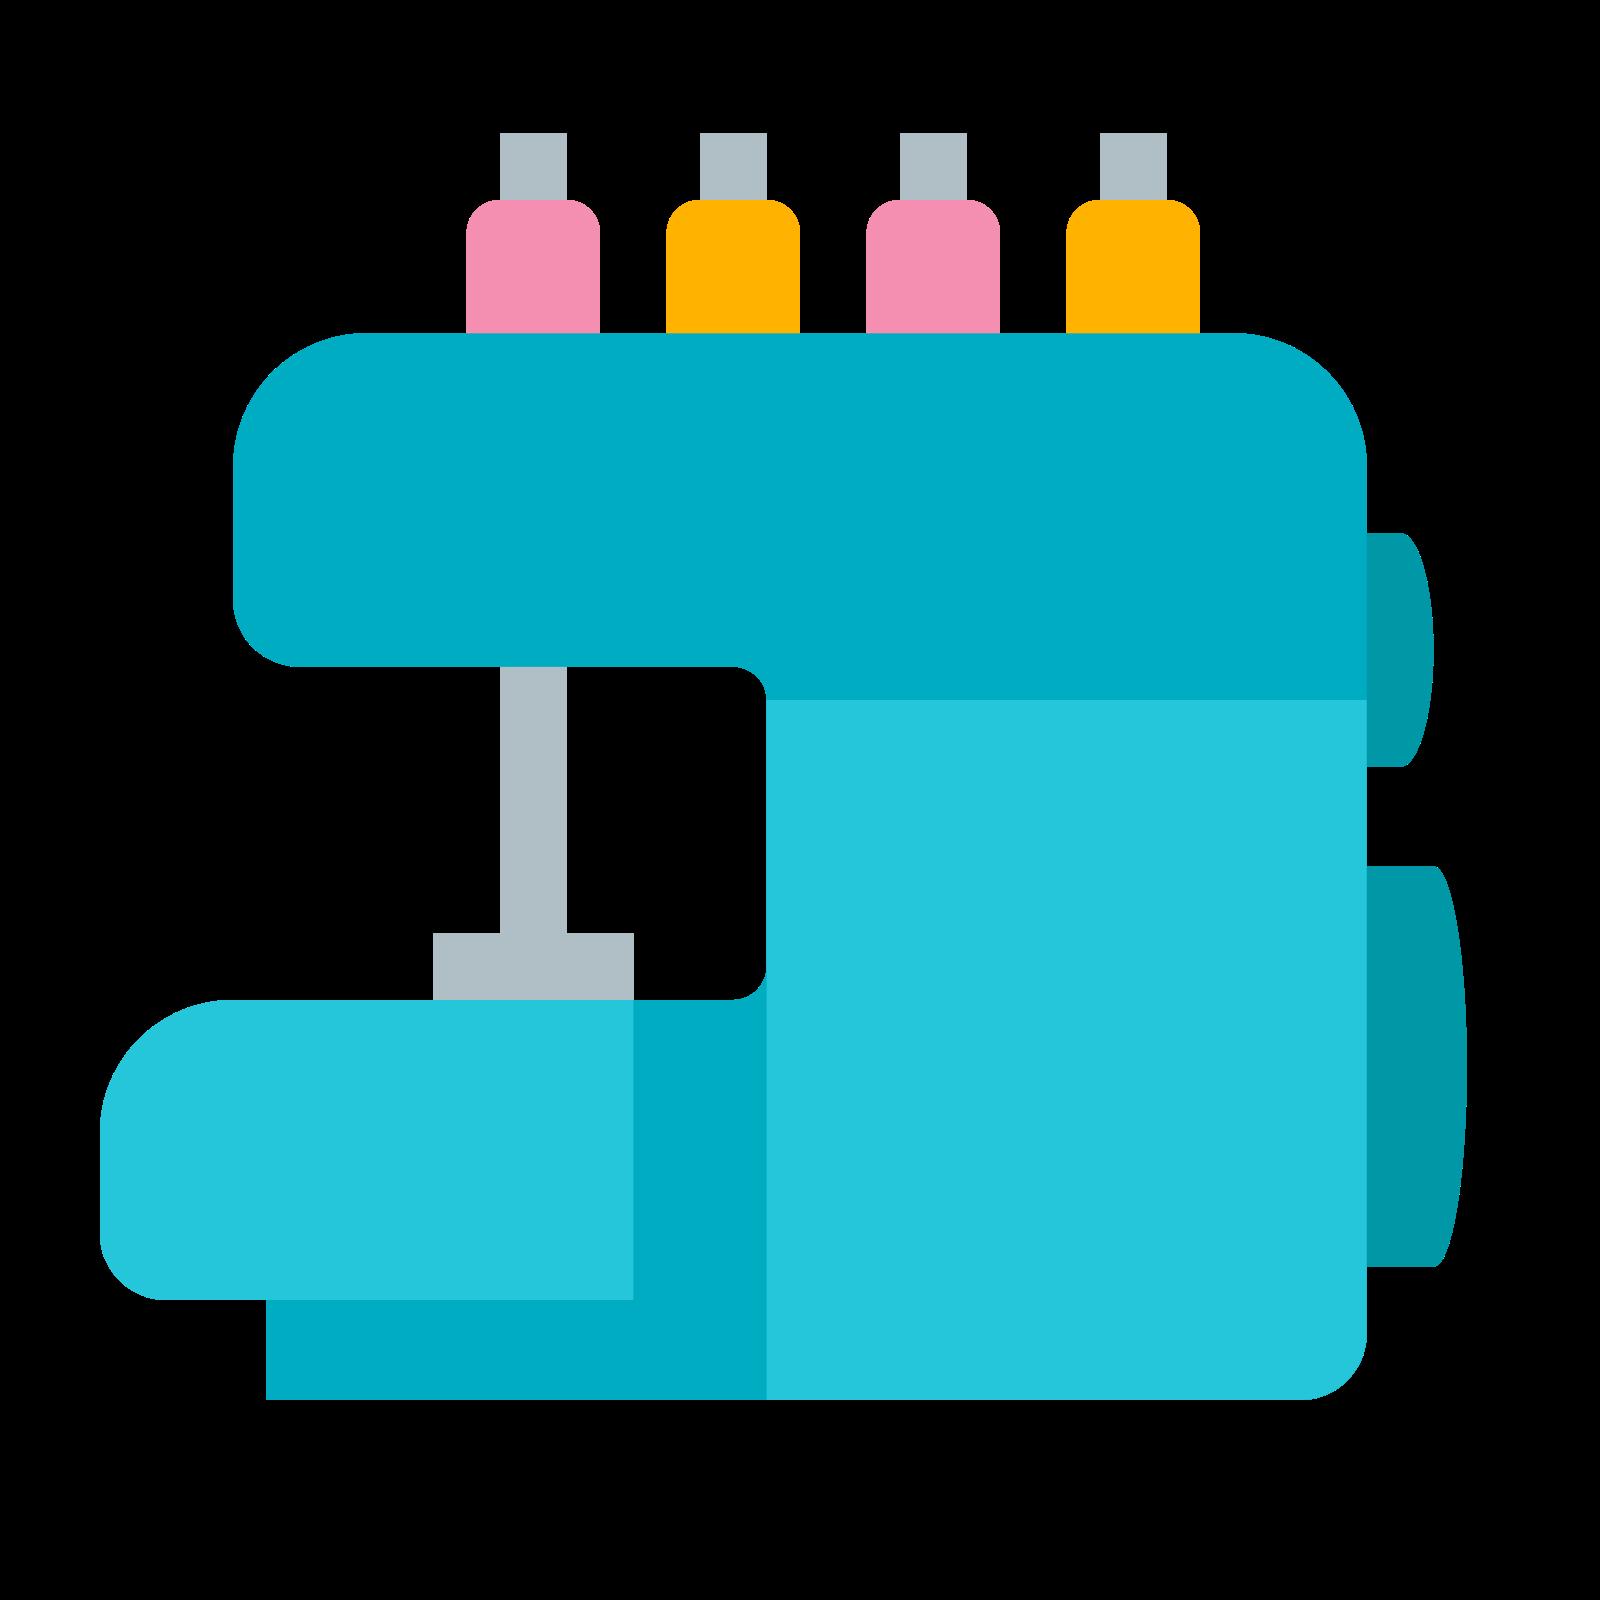 Overlock-Maschine icon